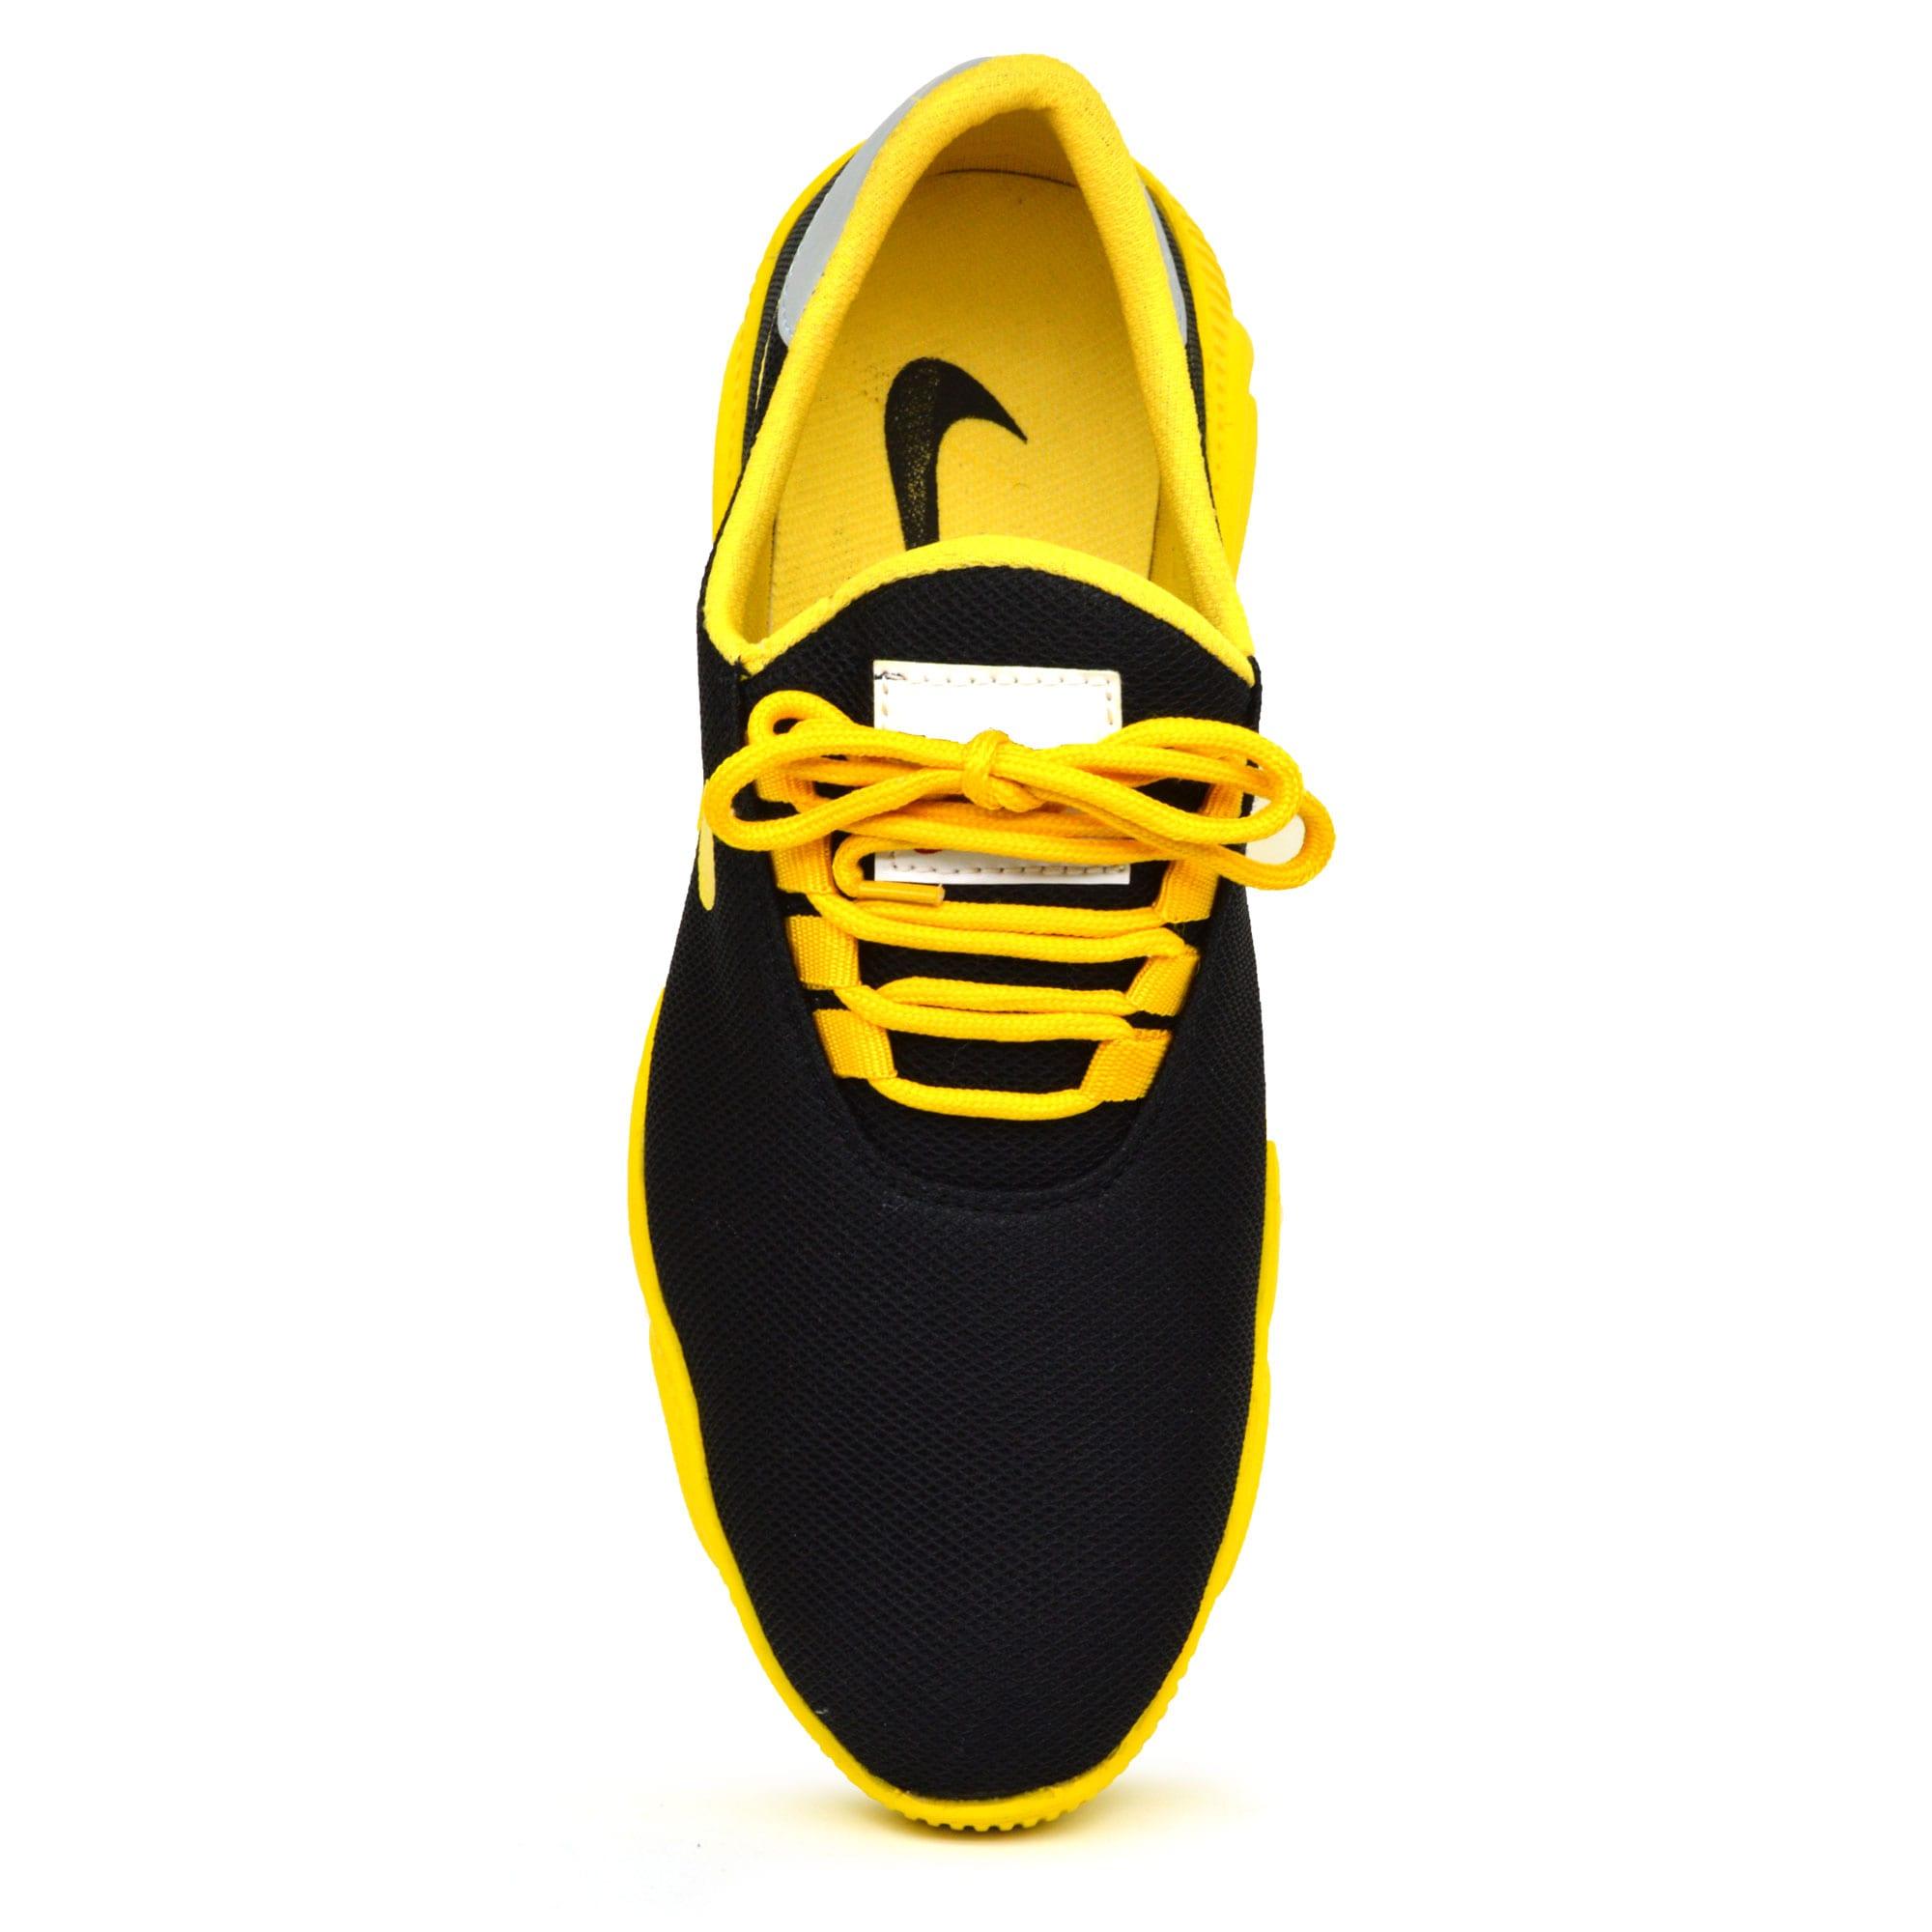 IMCOLUS10.171_BLACK  OUTDOOR WEAR & FLEXIBLE MENS Sports Shoes SHOES  IMCOLUS10.171_BLACK (BLACK,6TO10,8 PAIR)